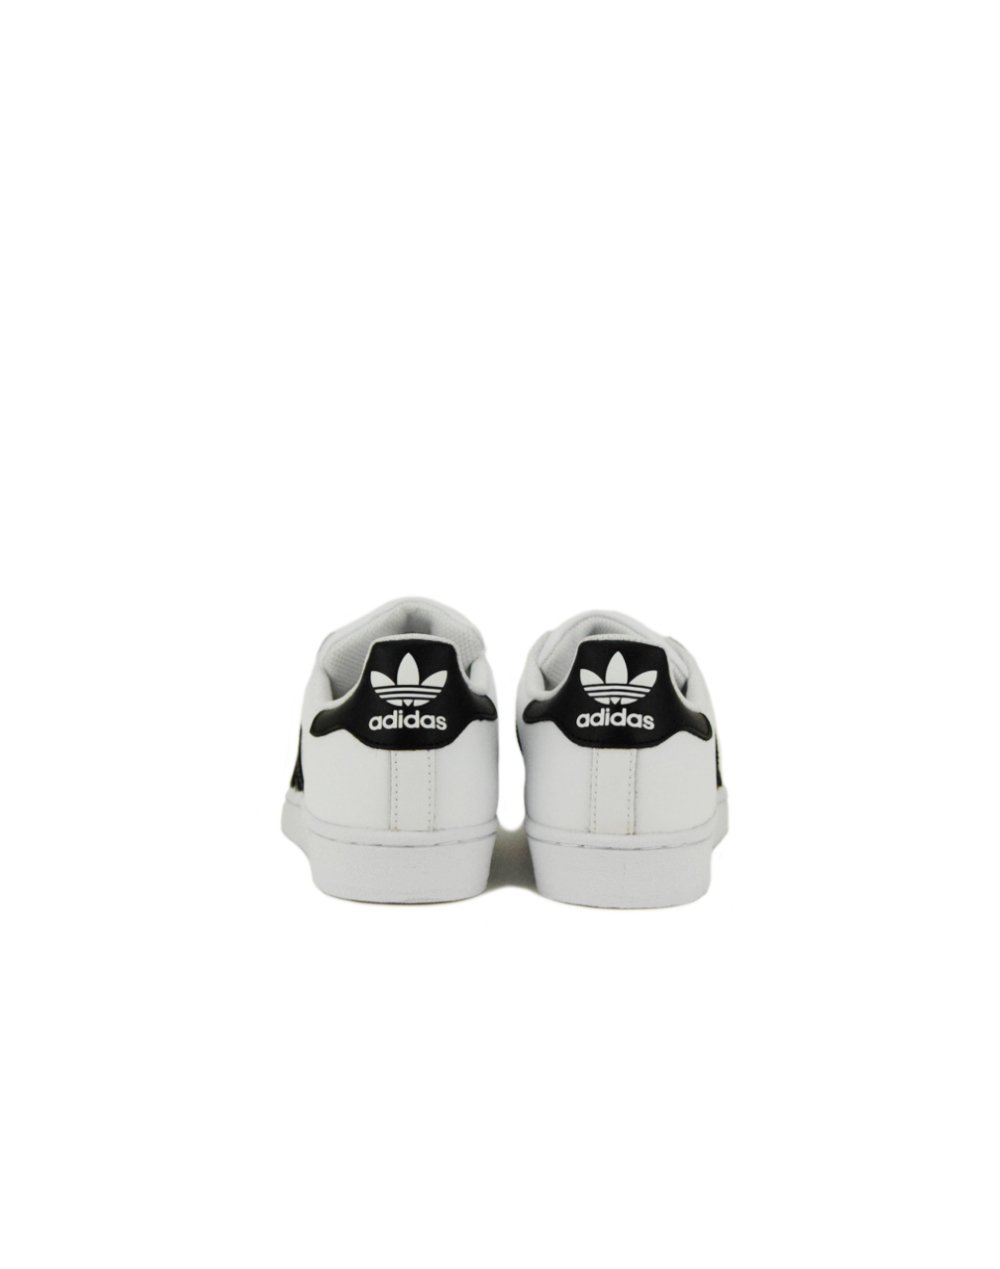 Adidas Superstar J (FU7712) White/Black